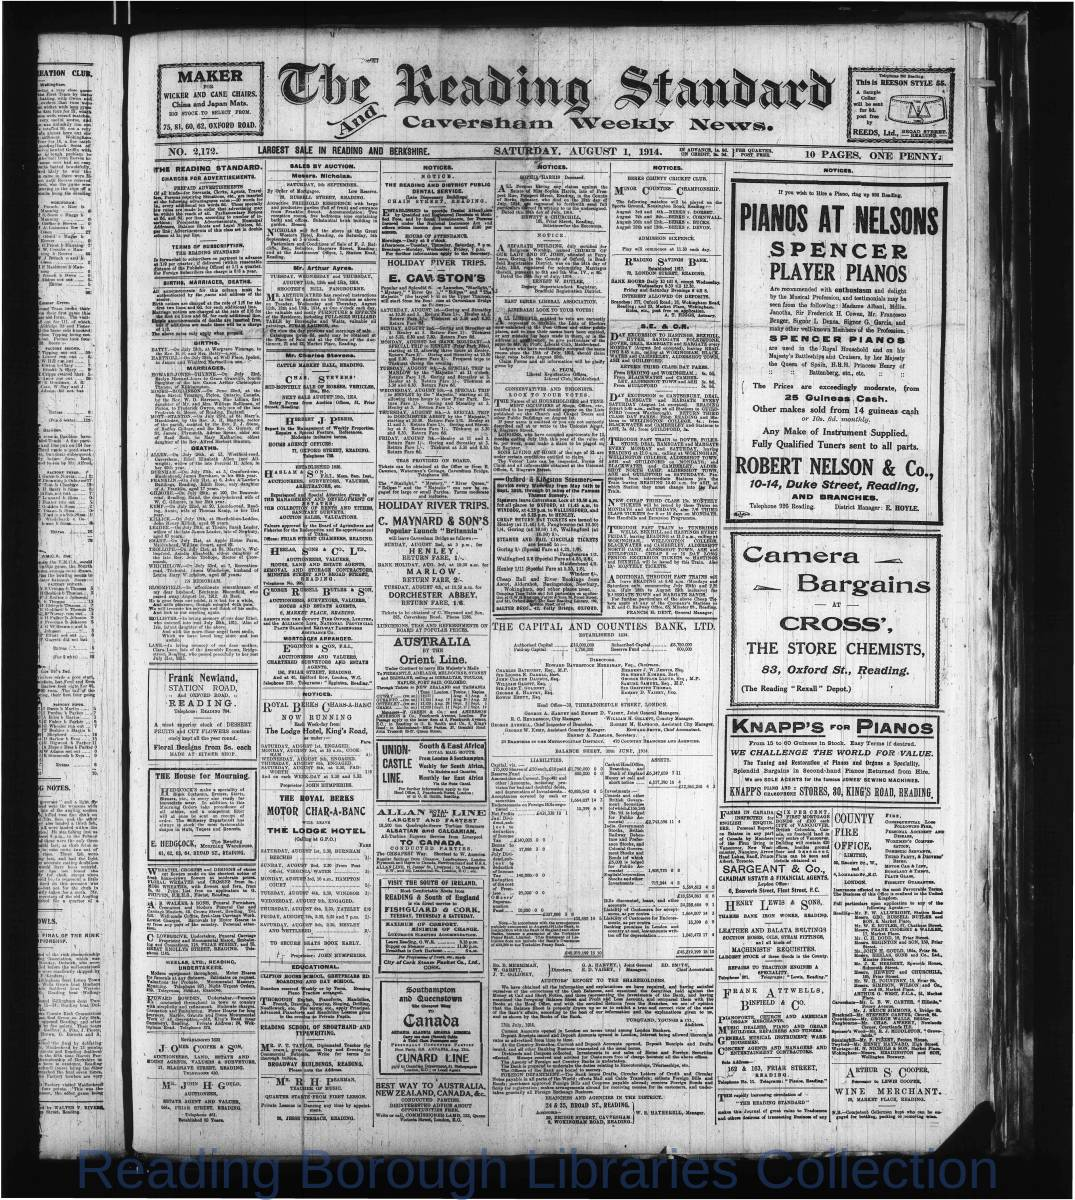 Reading Standard, Saturday, August 1,  1914. Pg 1